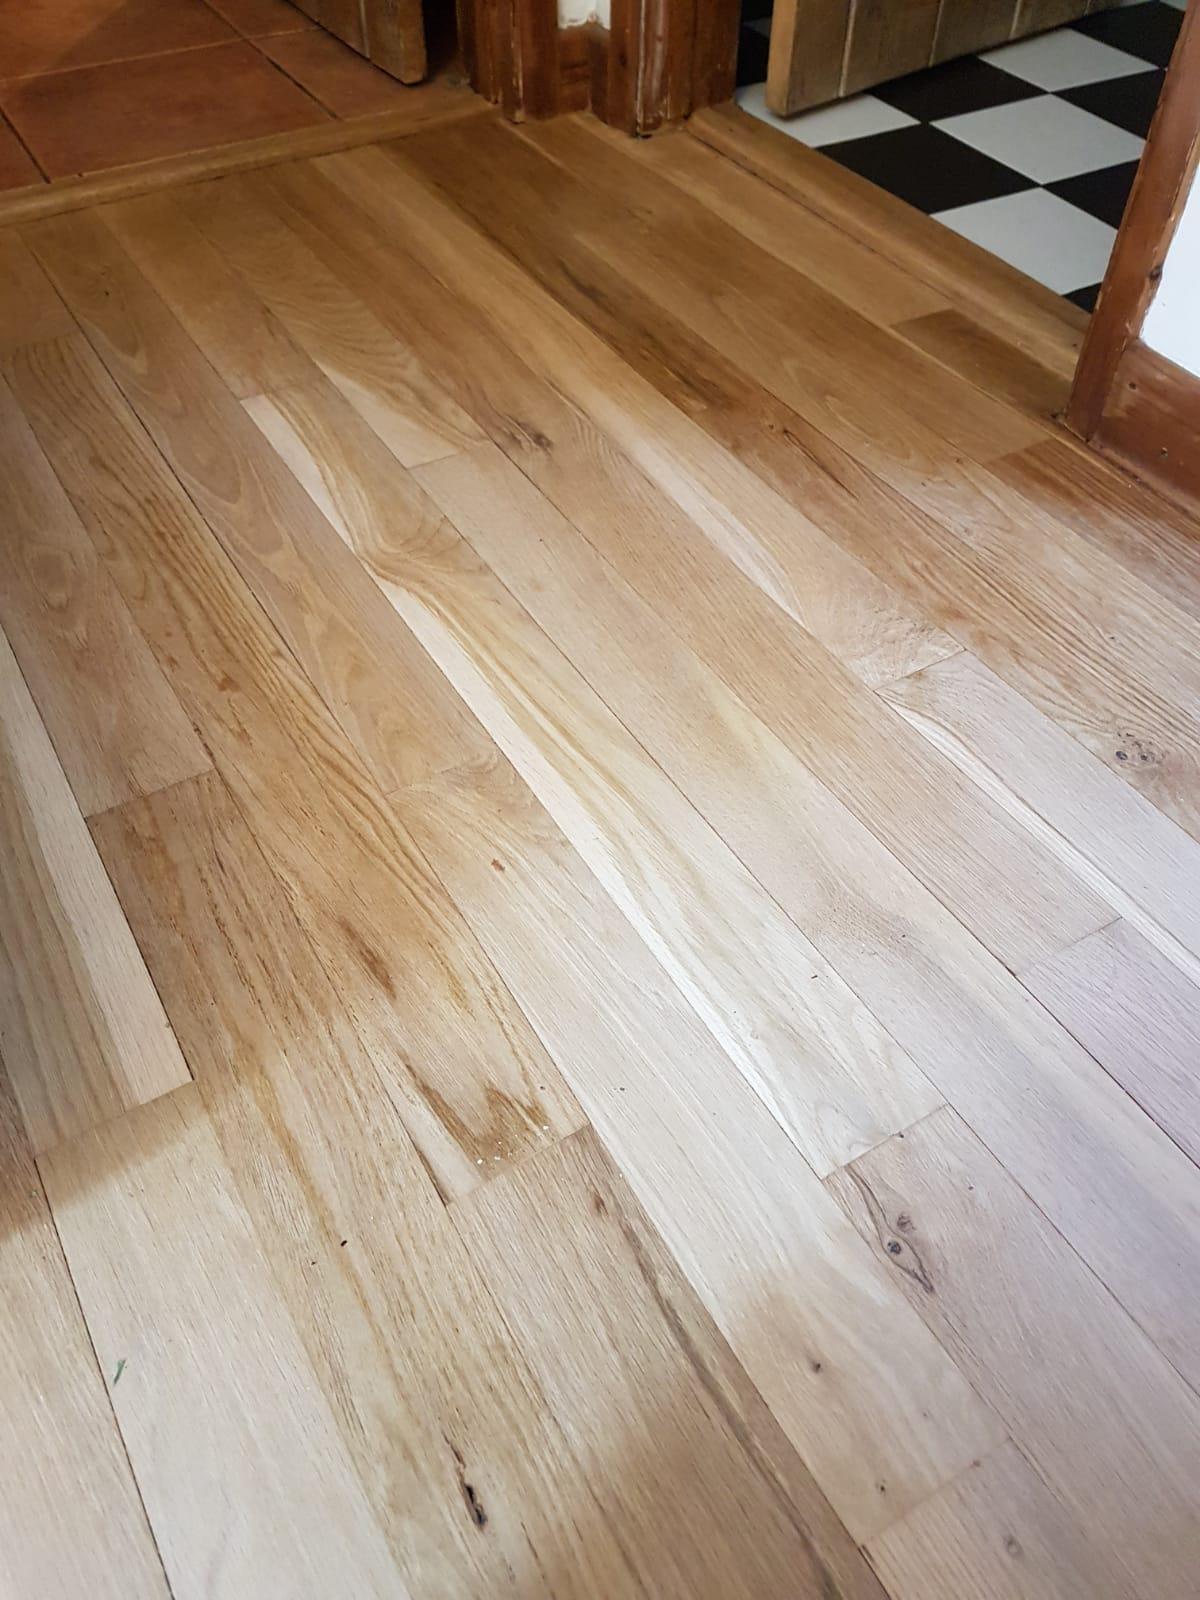 Sanded Floor Boards